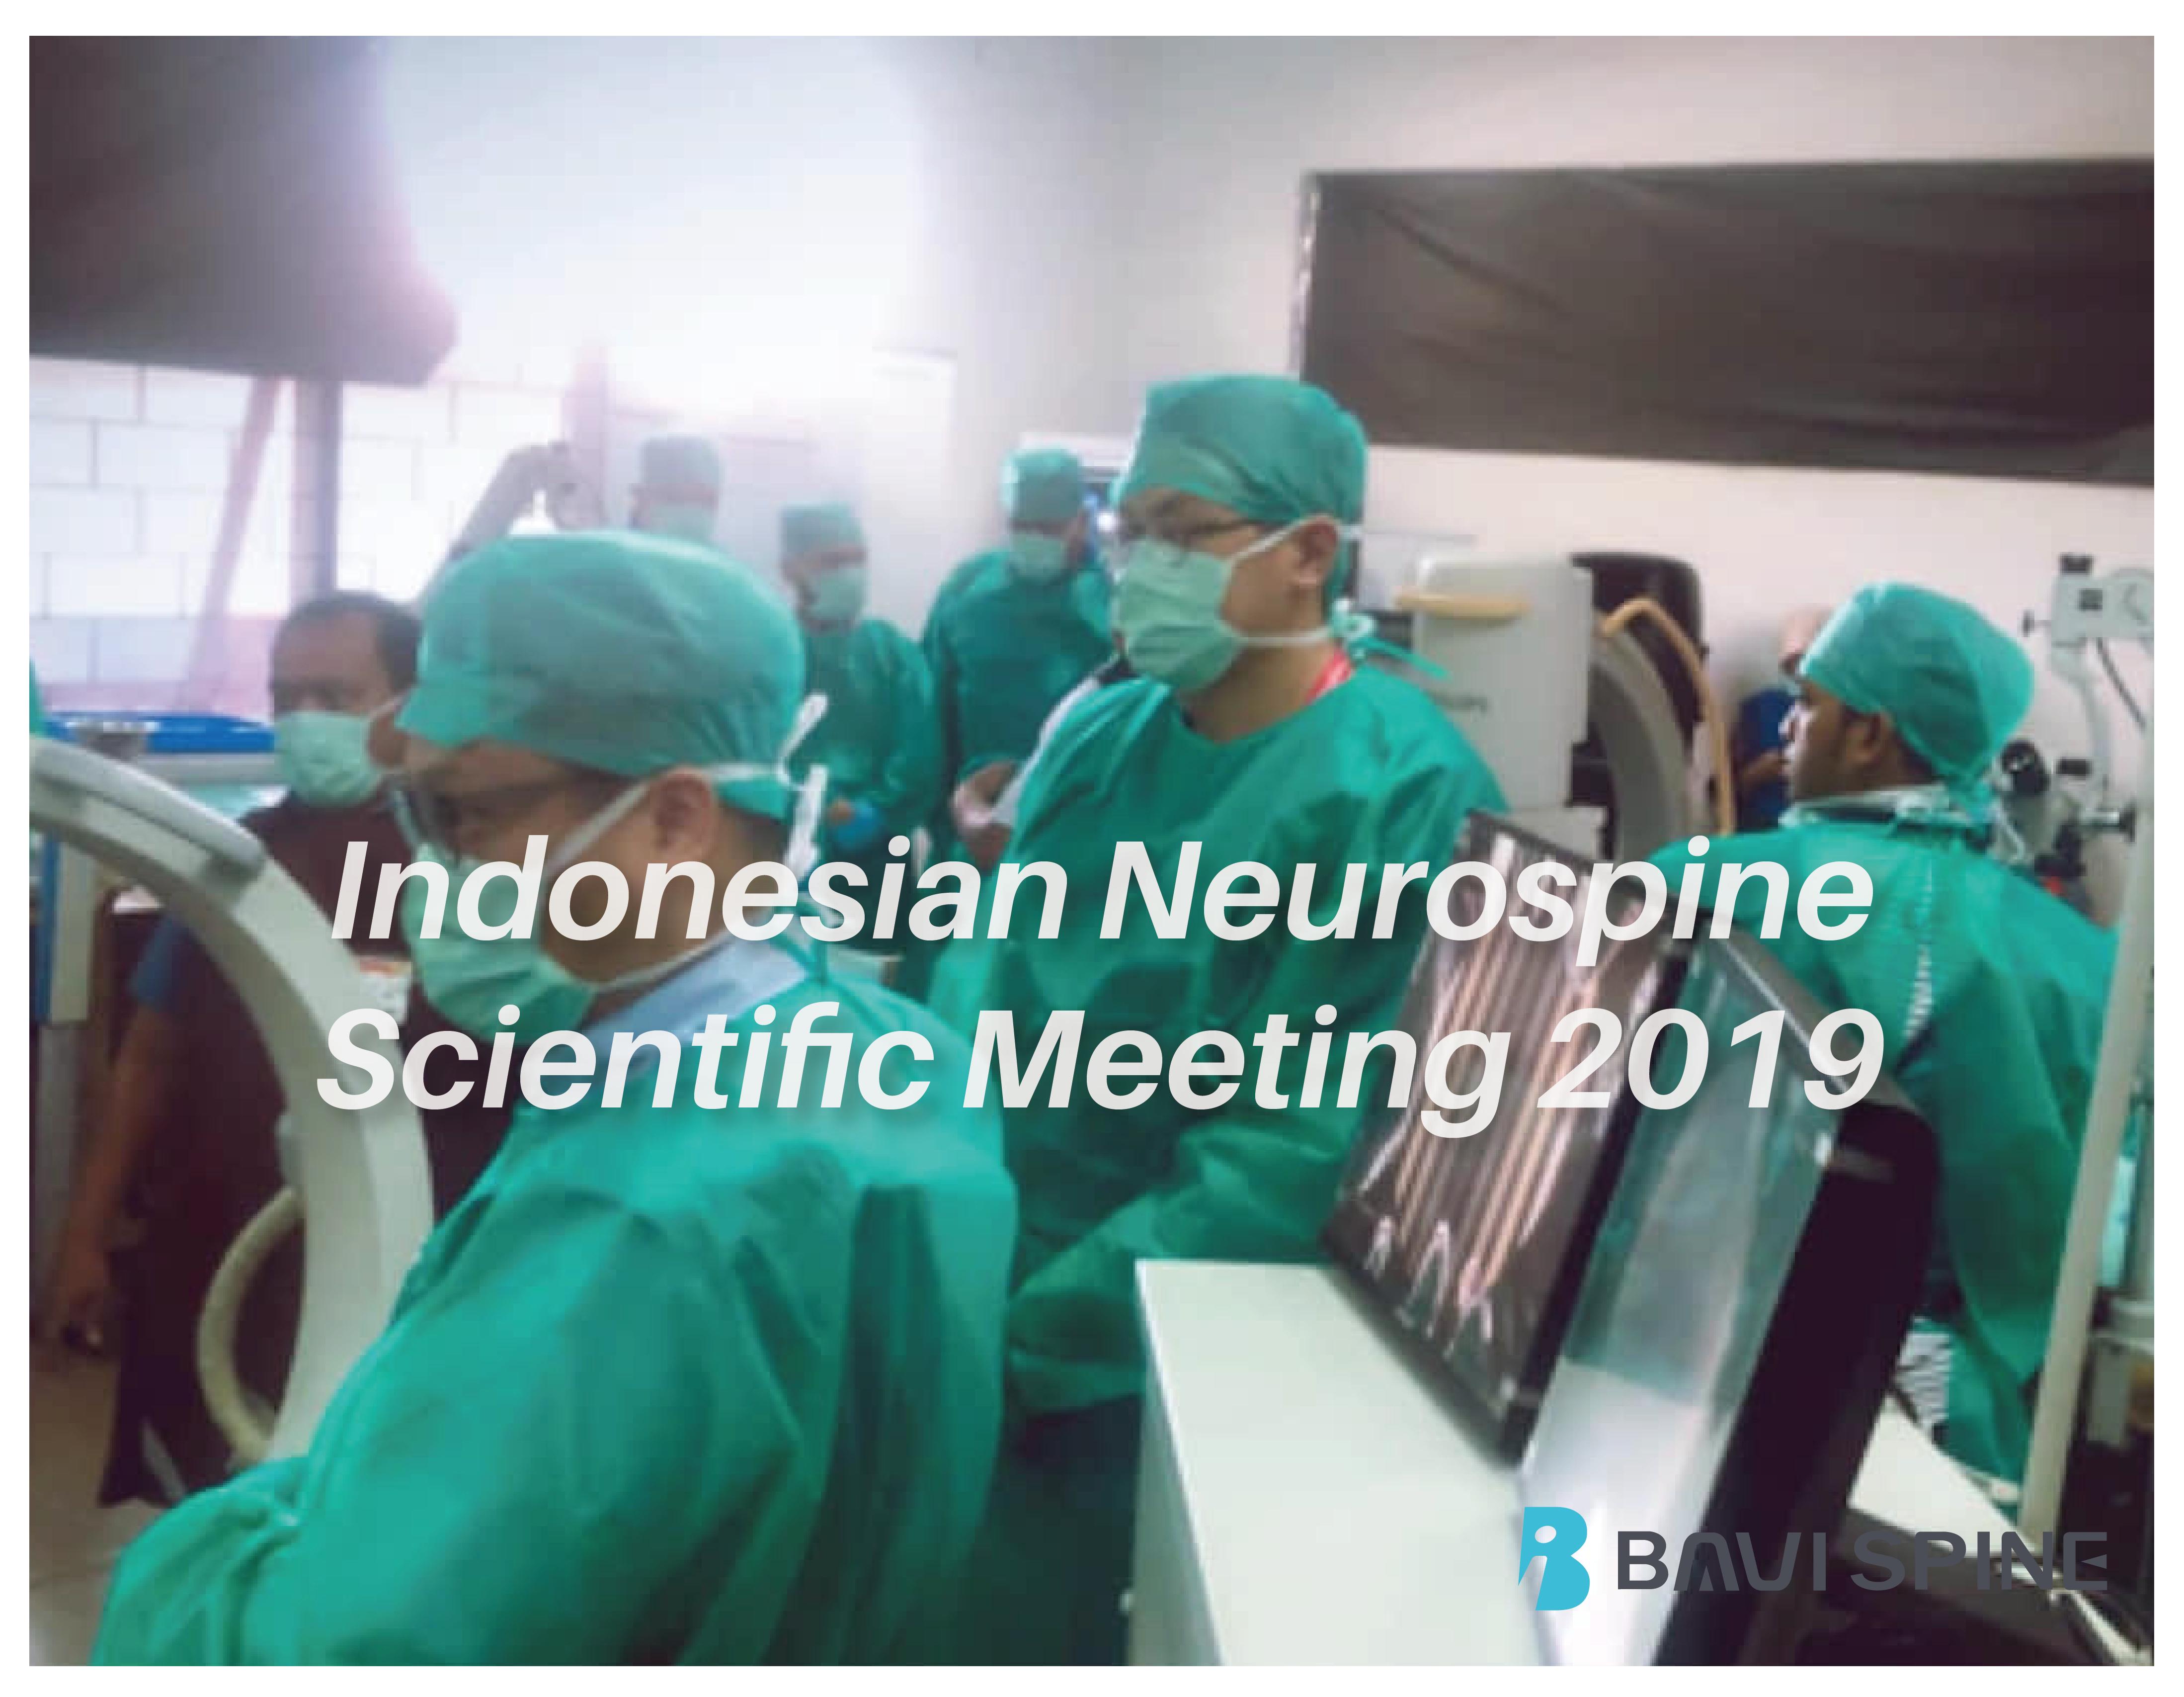 2019 Neurospine Scientific Meeting